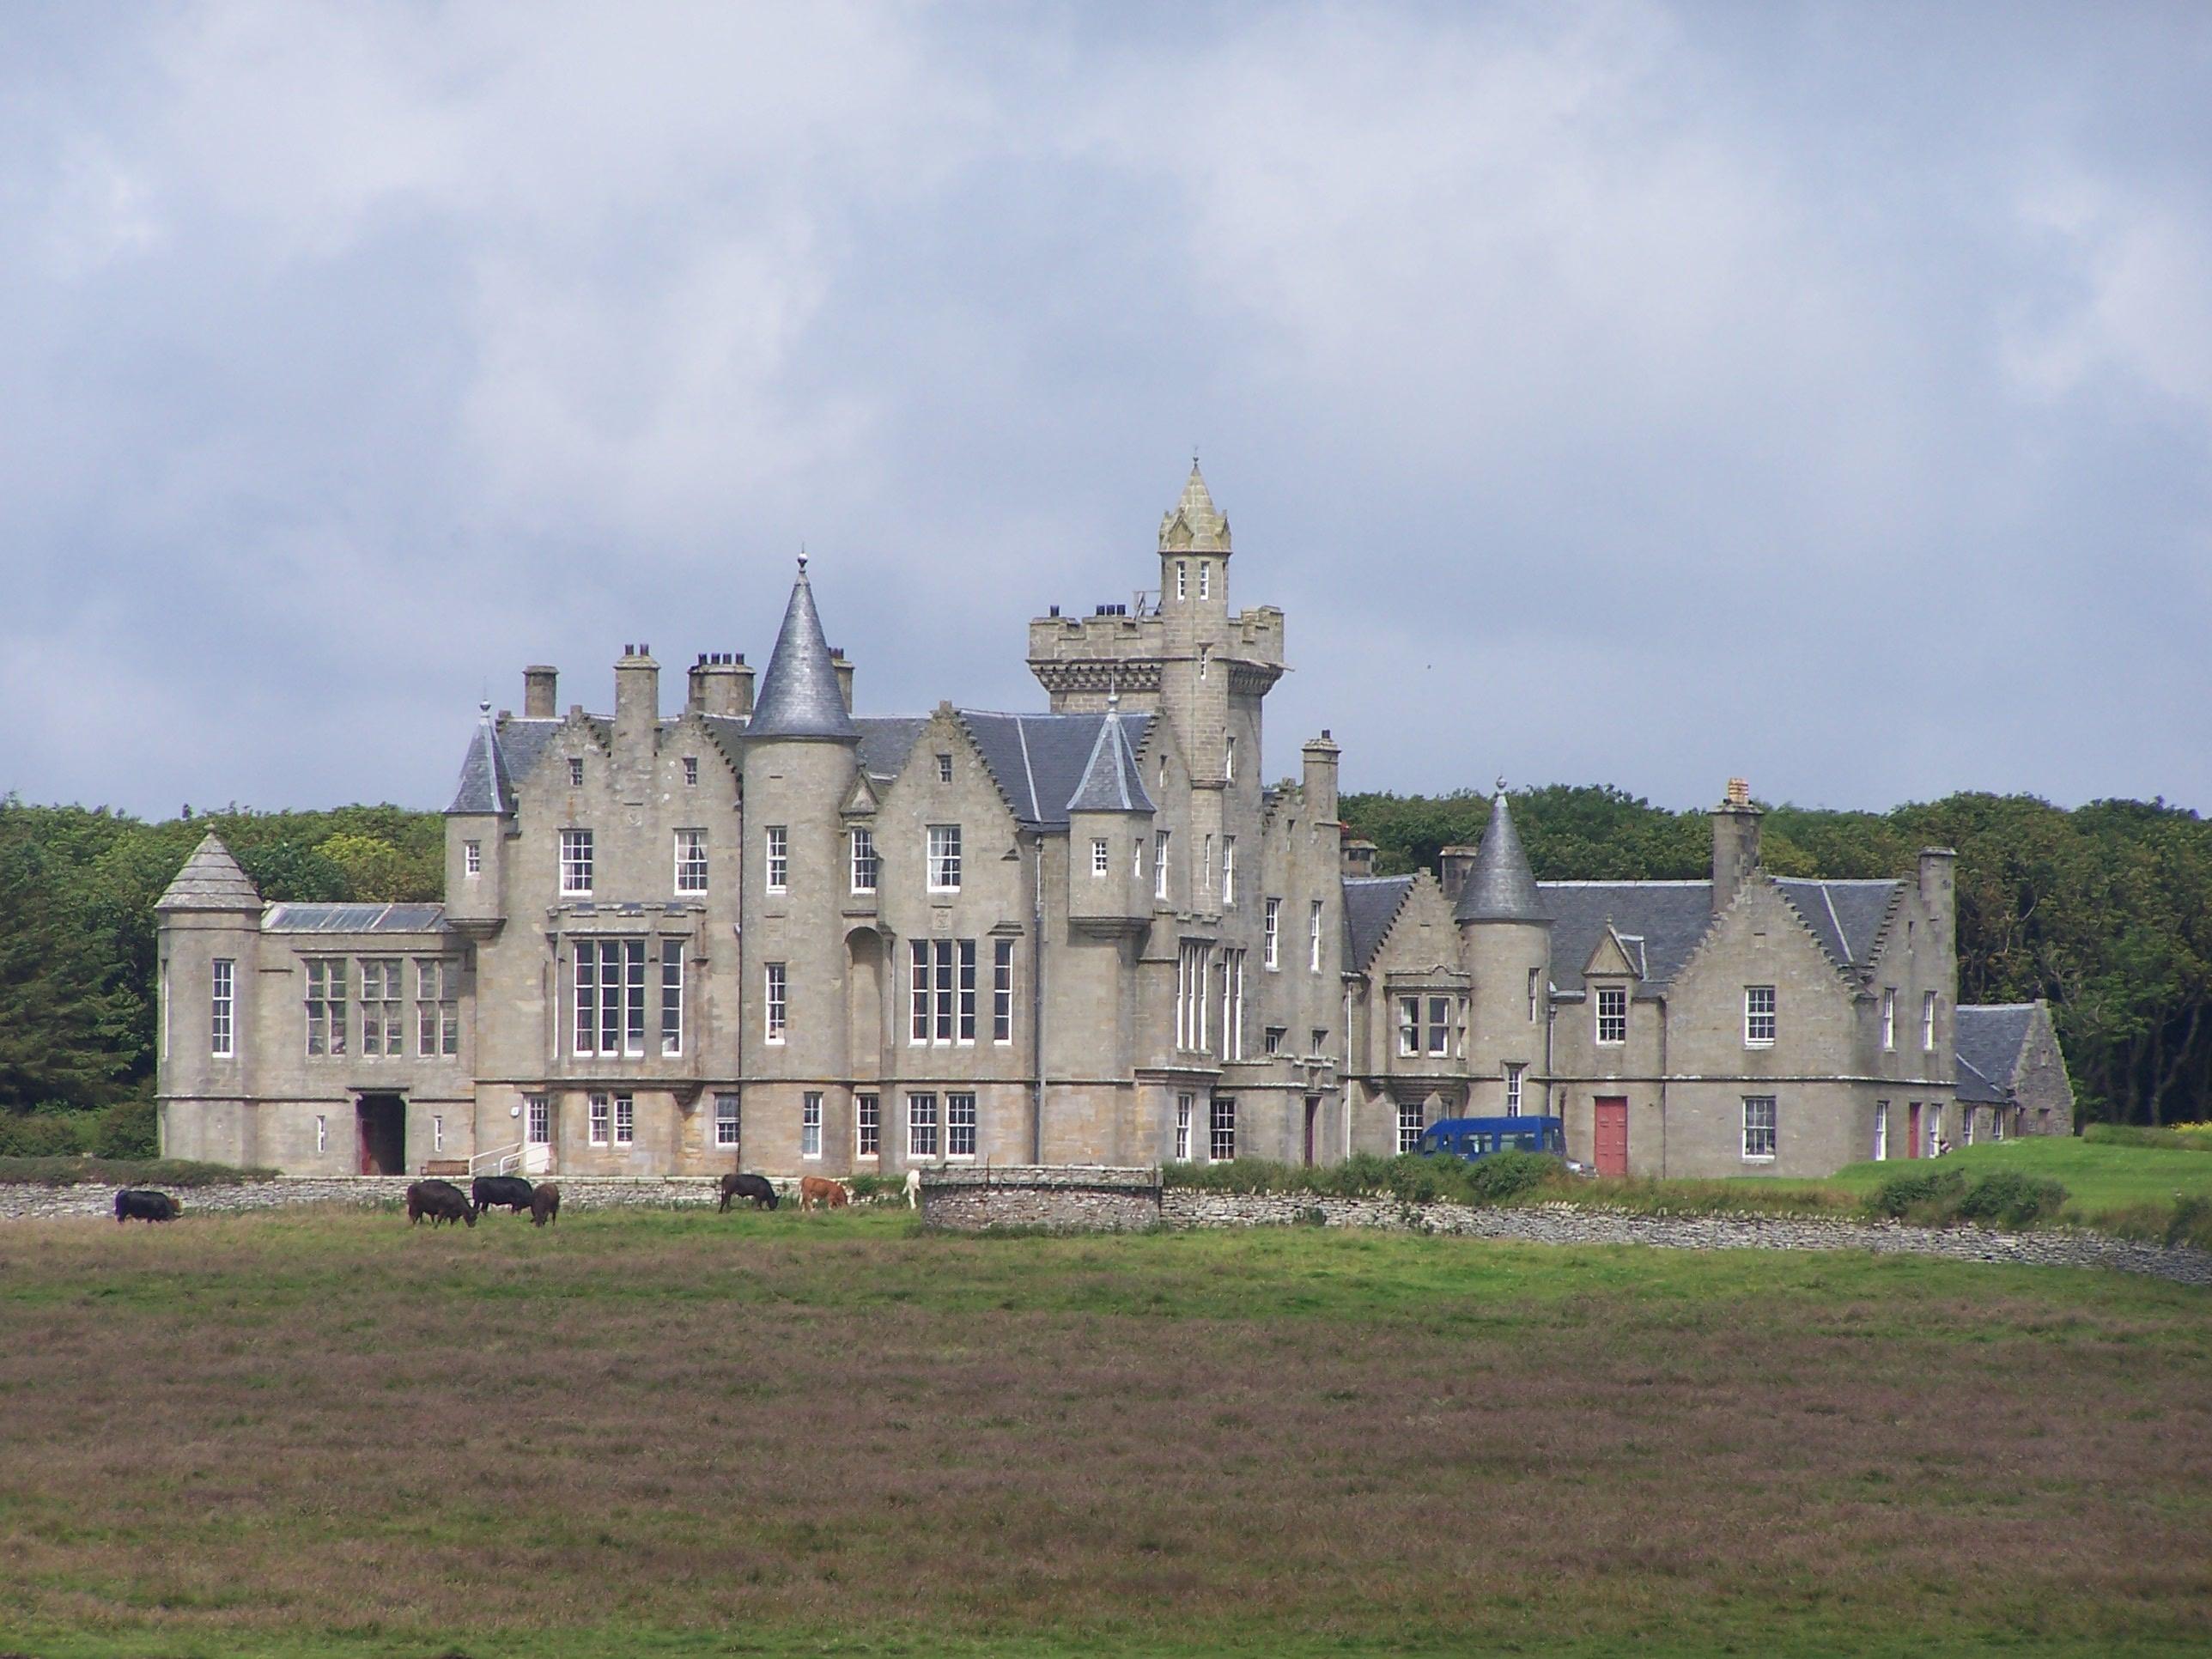 Balfour Castle, Hebrides & Isles copyright Purplebaron